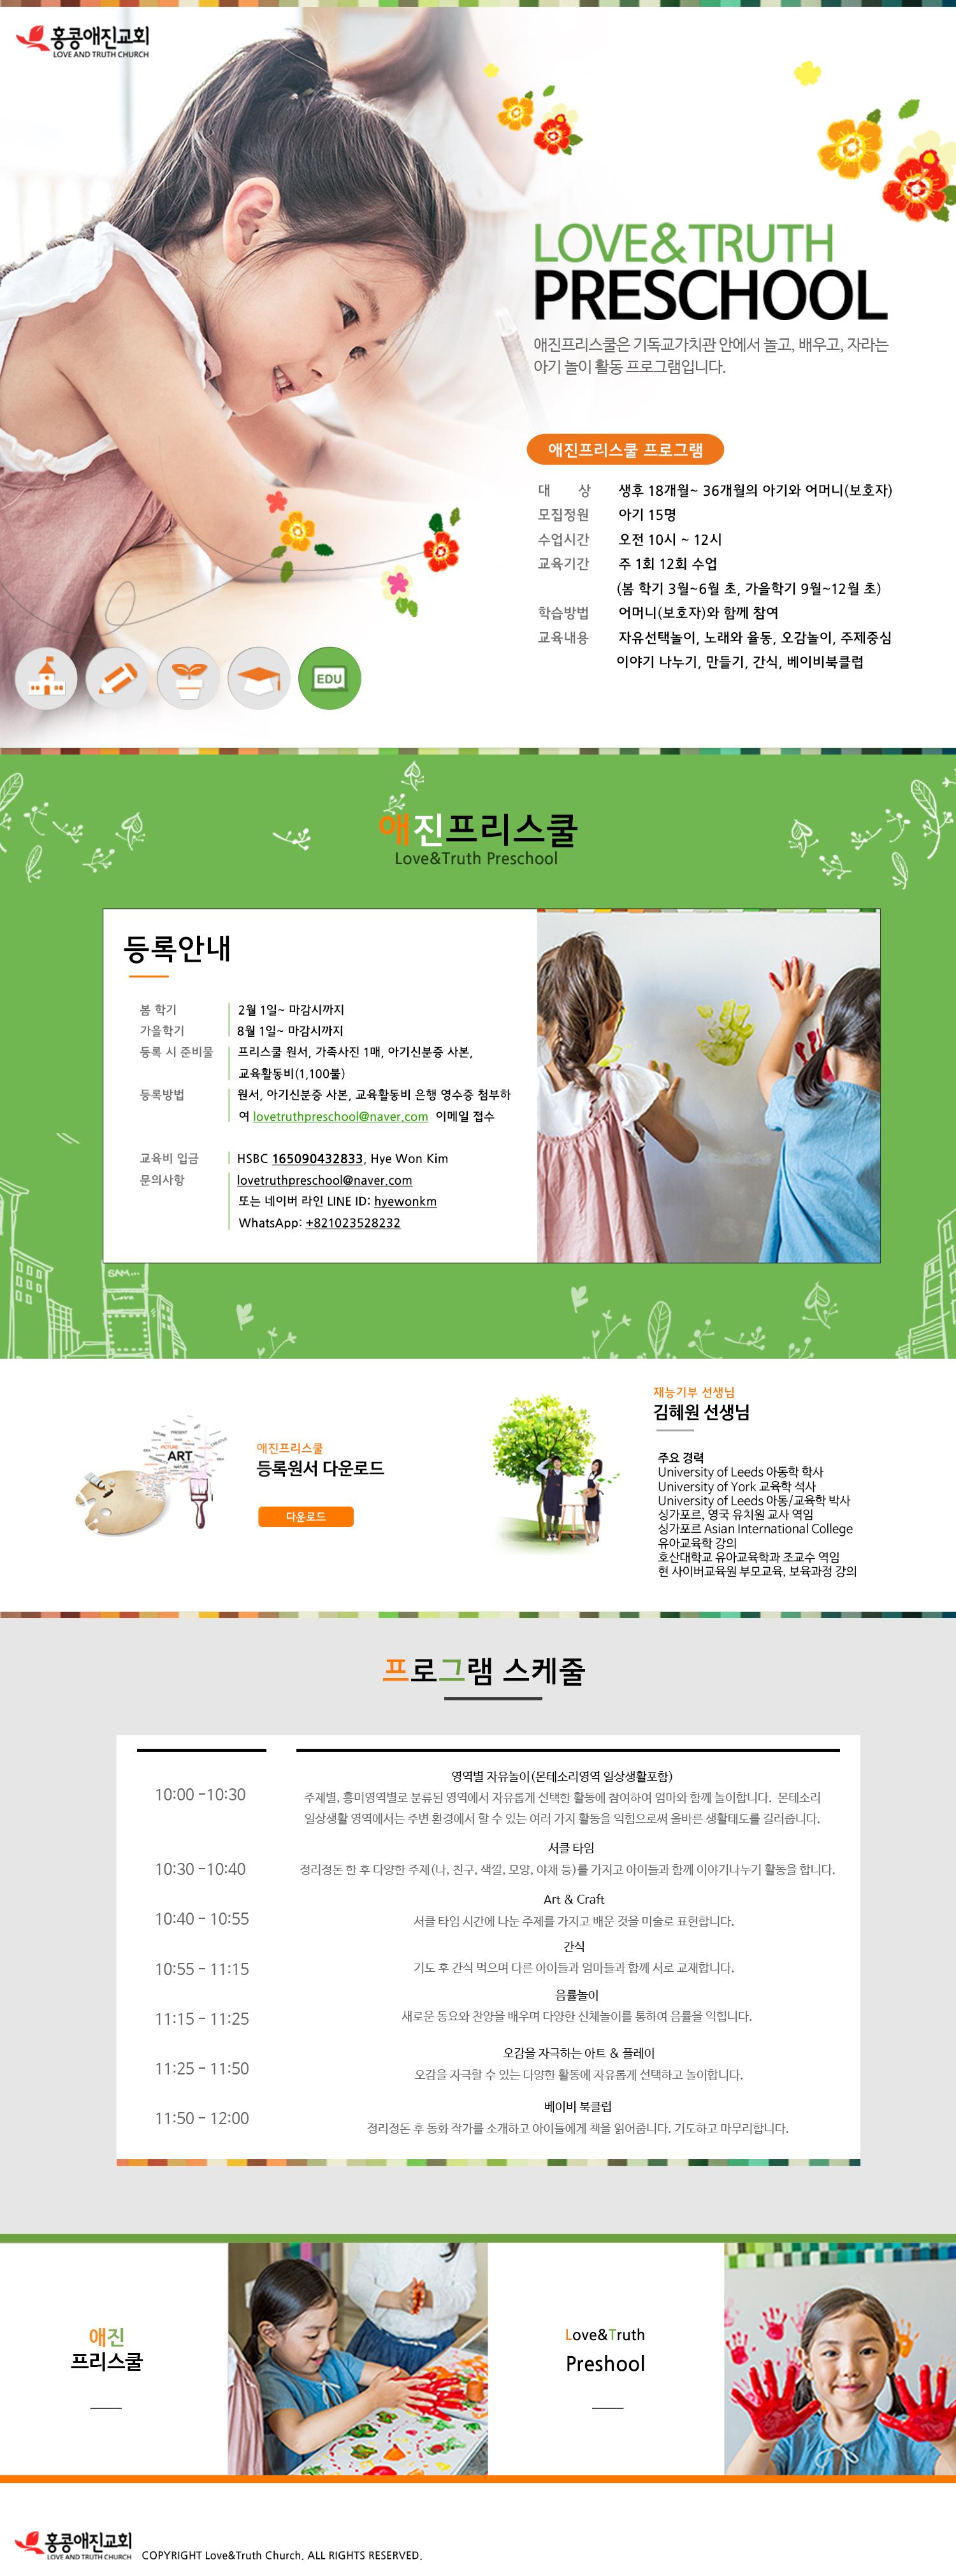 LT_Preschool_Website_1500px.jpg